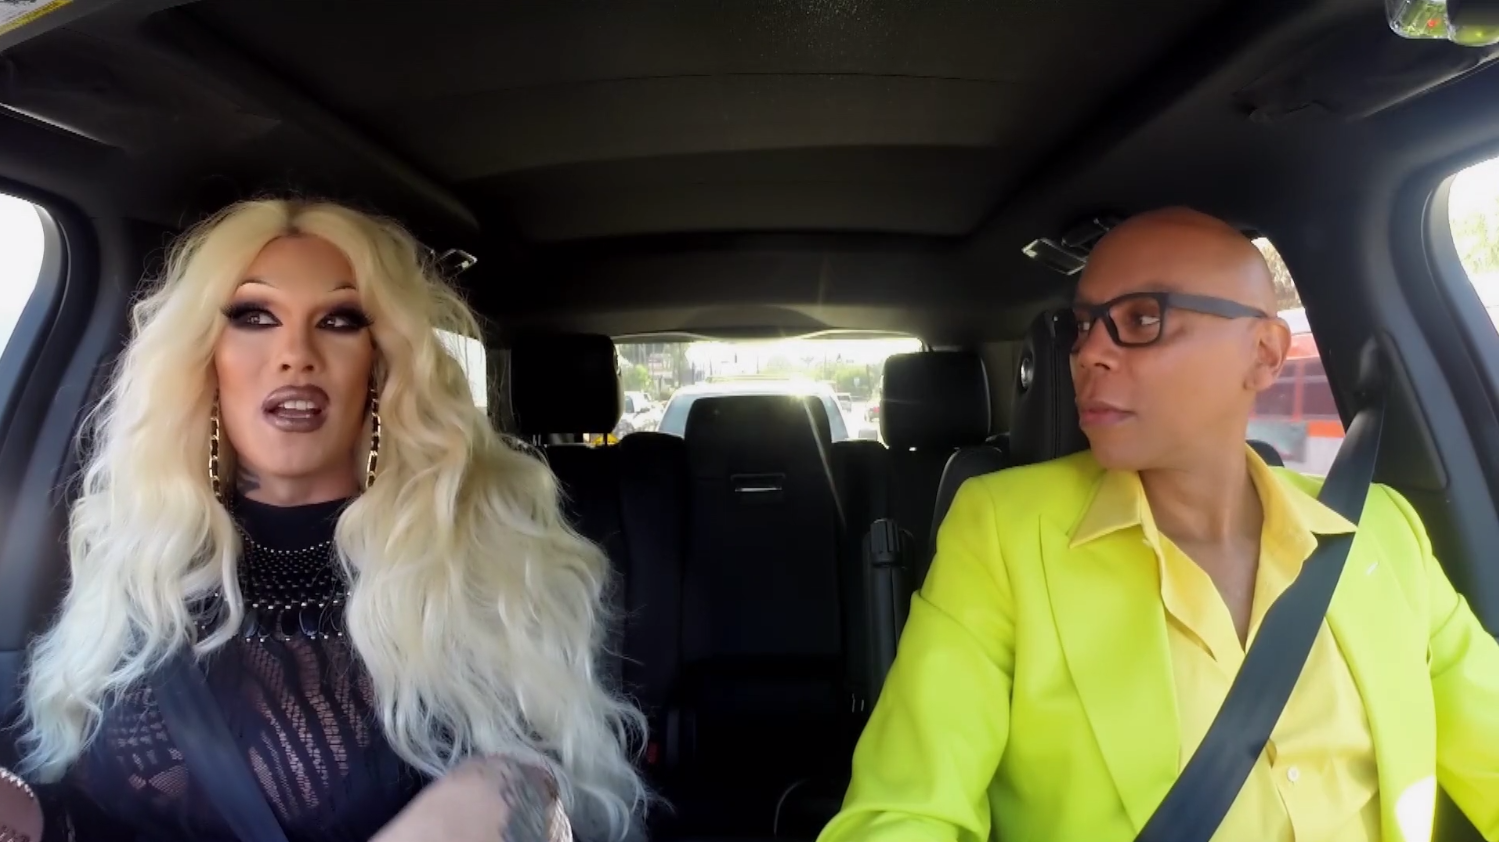 interview drag queen carpool kimora blac rupaul s mtv hits logo png mtv logo png image